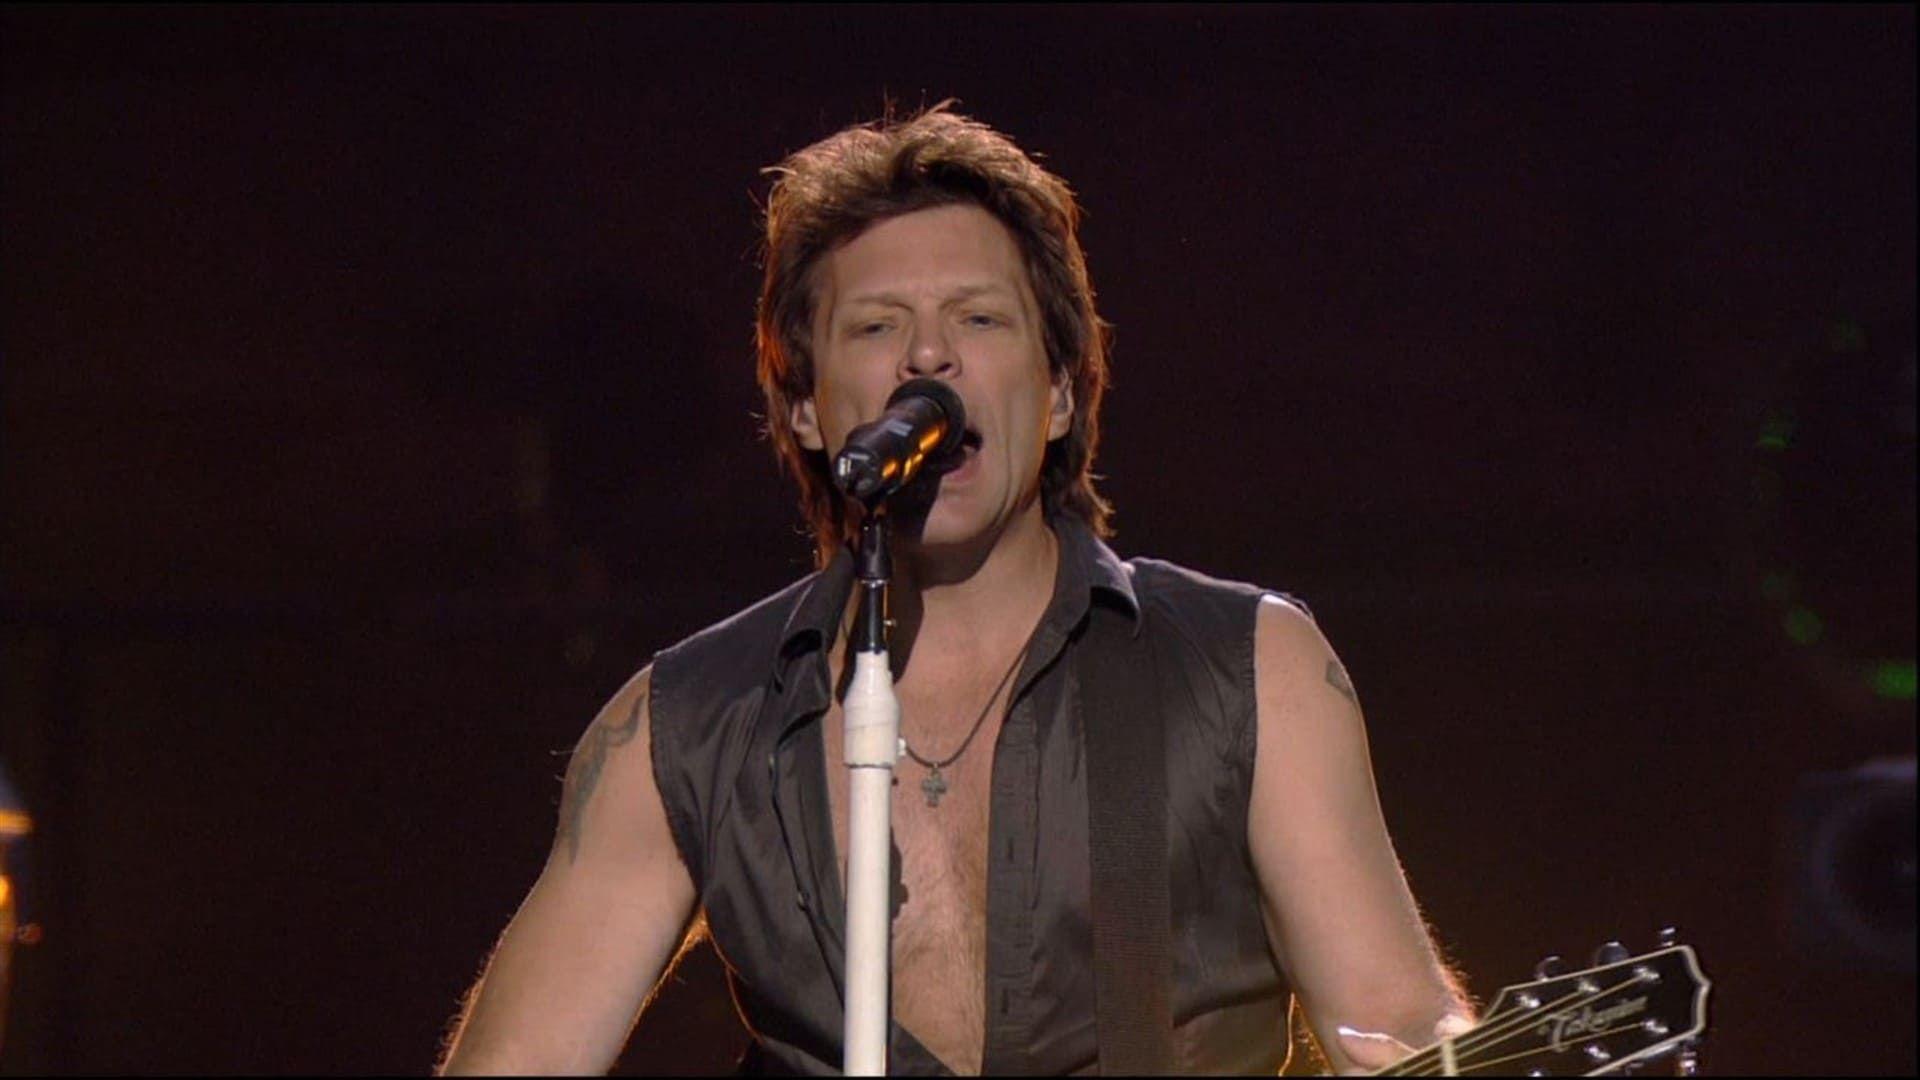 Bon Jovi: Live At Madison Square Garden (2008) - Where to